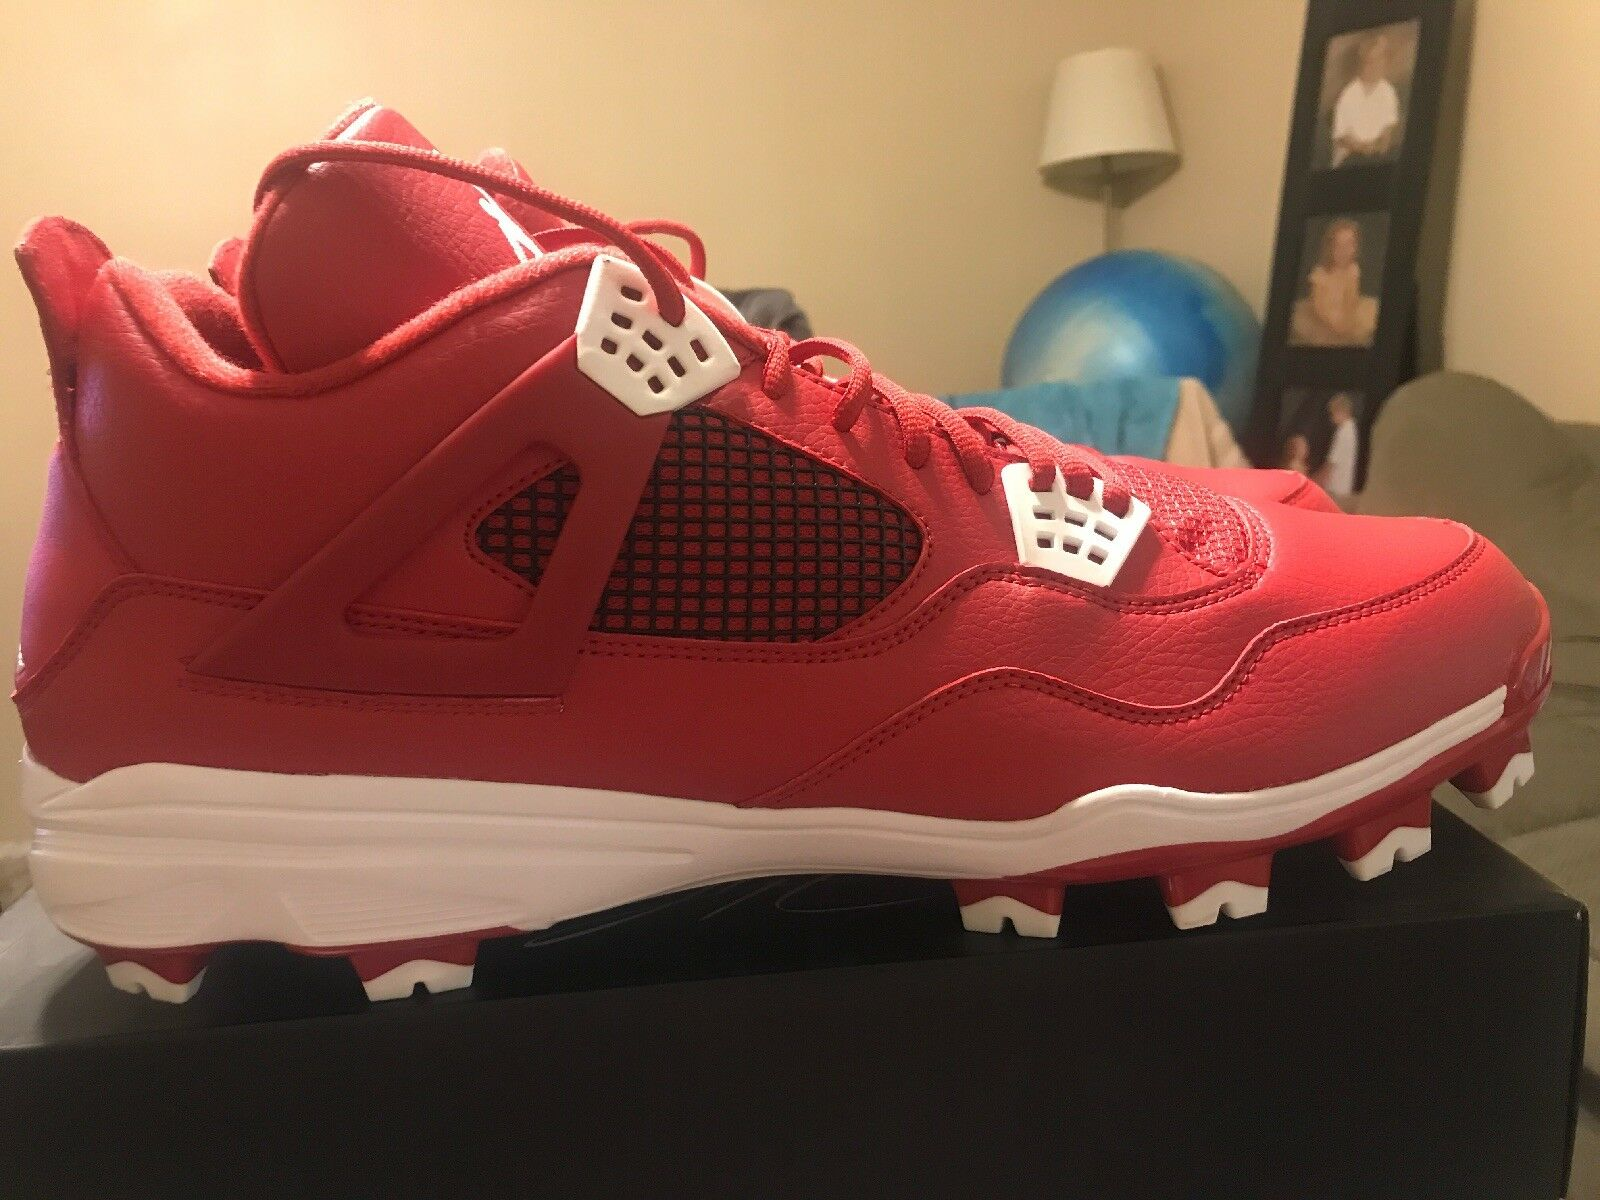 New Nike Air Jordan Retro IV 4 Baseball Cleats Red White Sz 16 807709-601